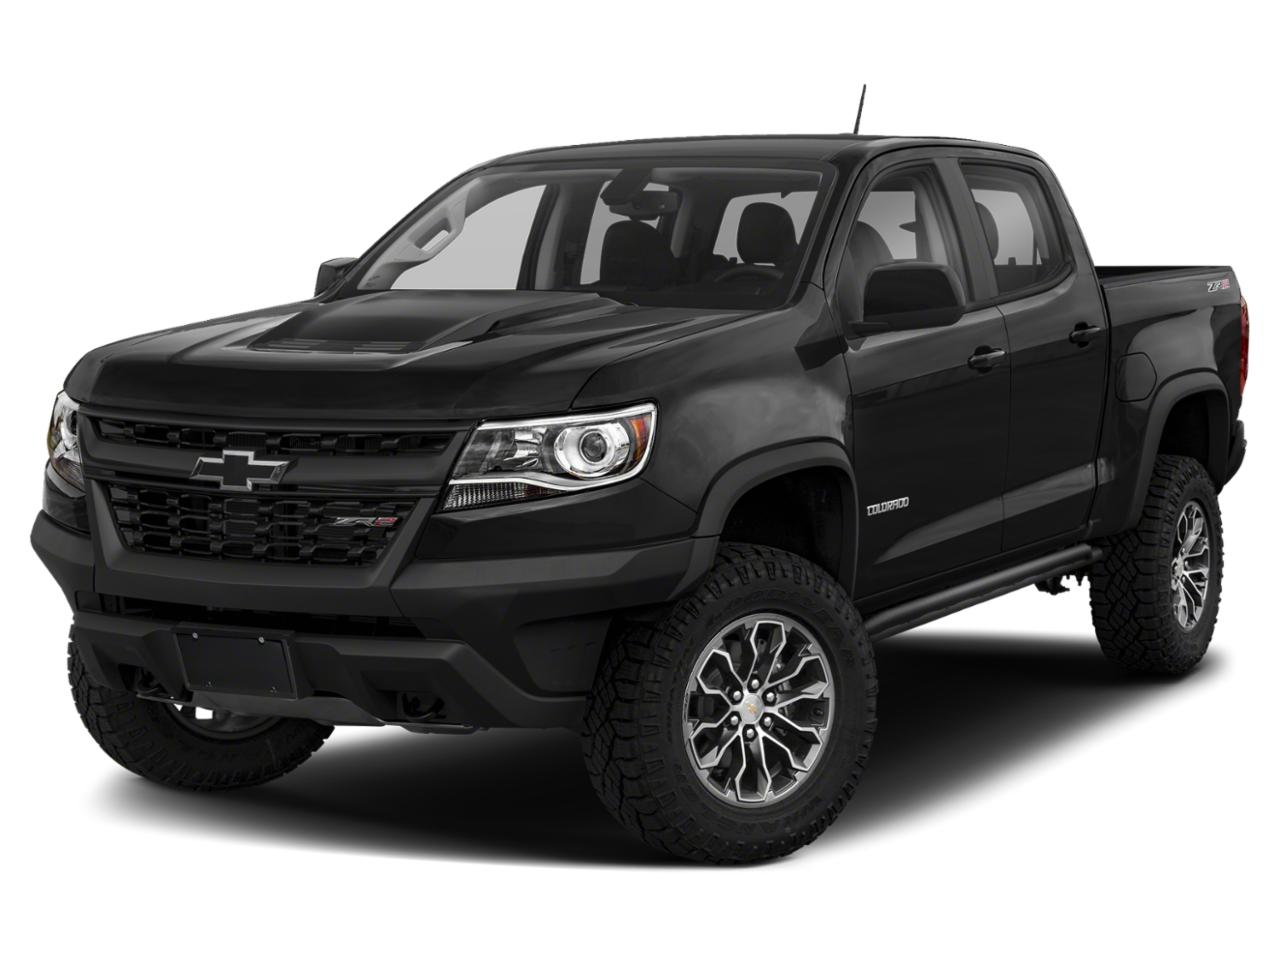 Black 2018 Chevrolet Colorado ZR2 Crew Cab Pickup Wake Forest NC